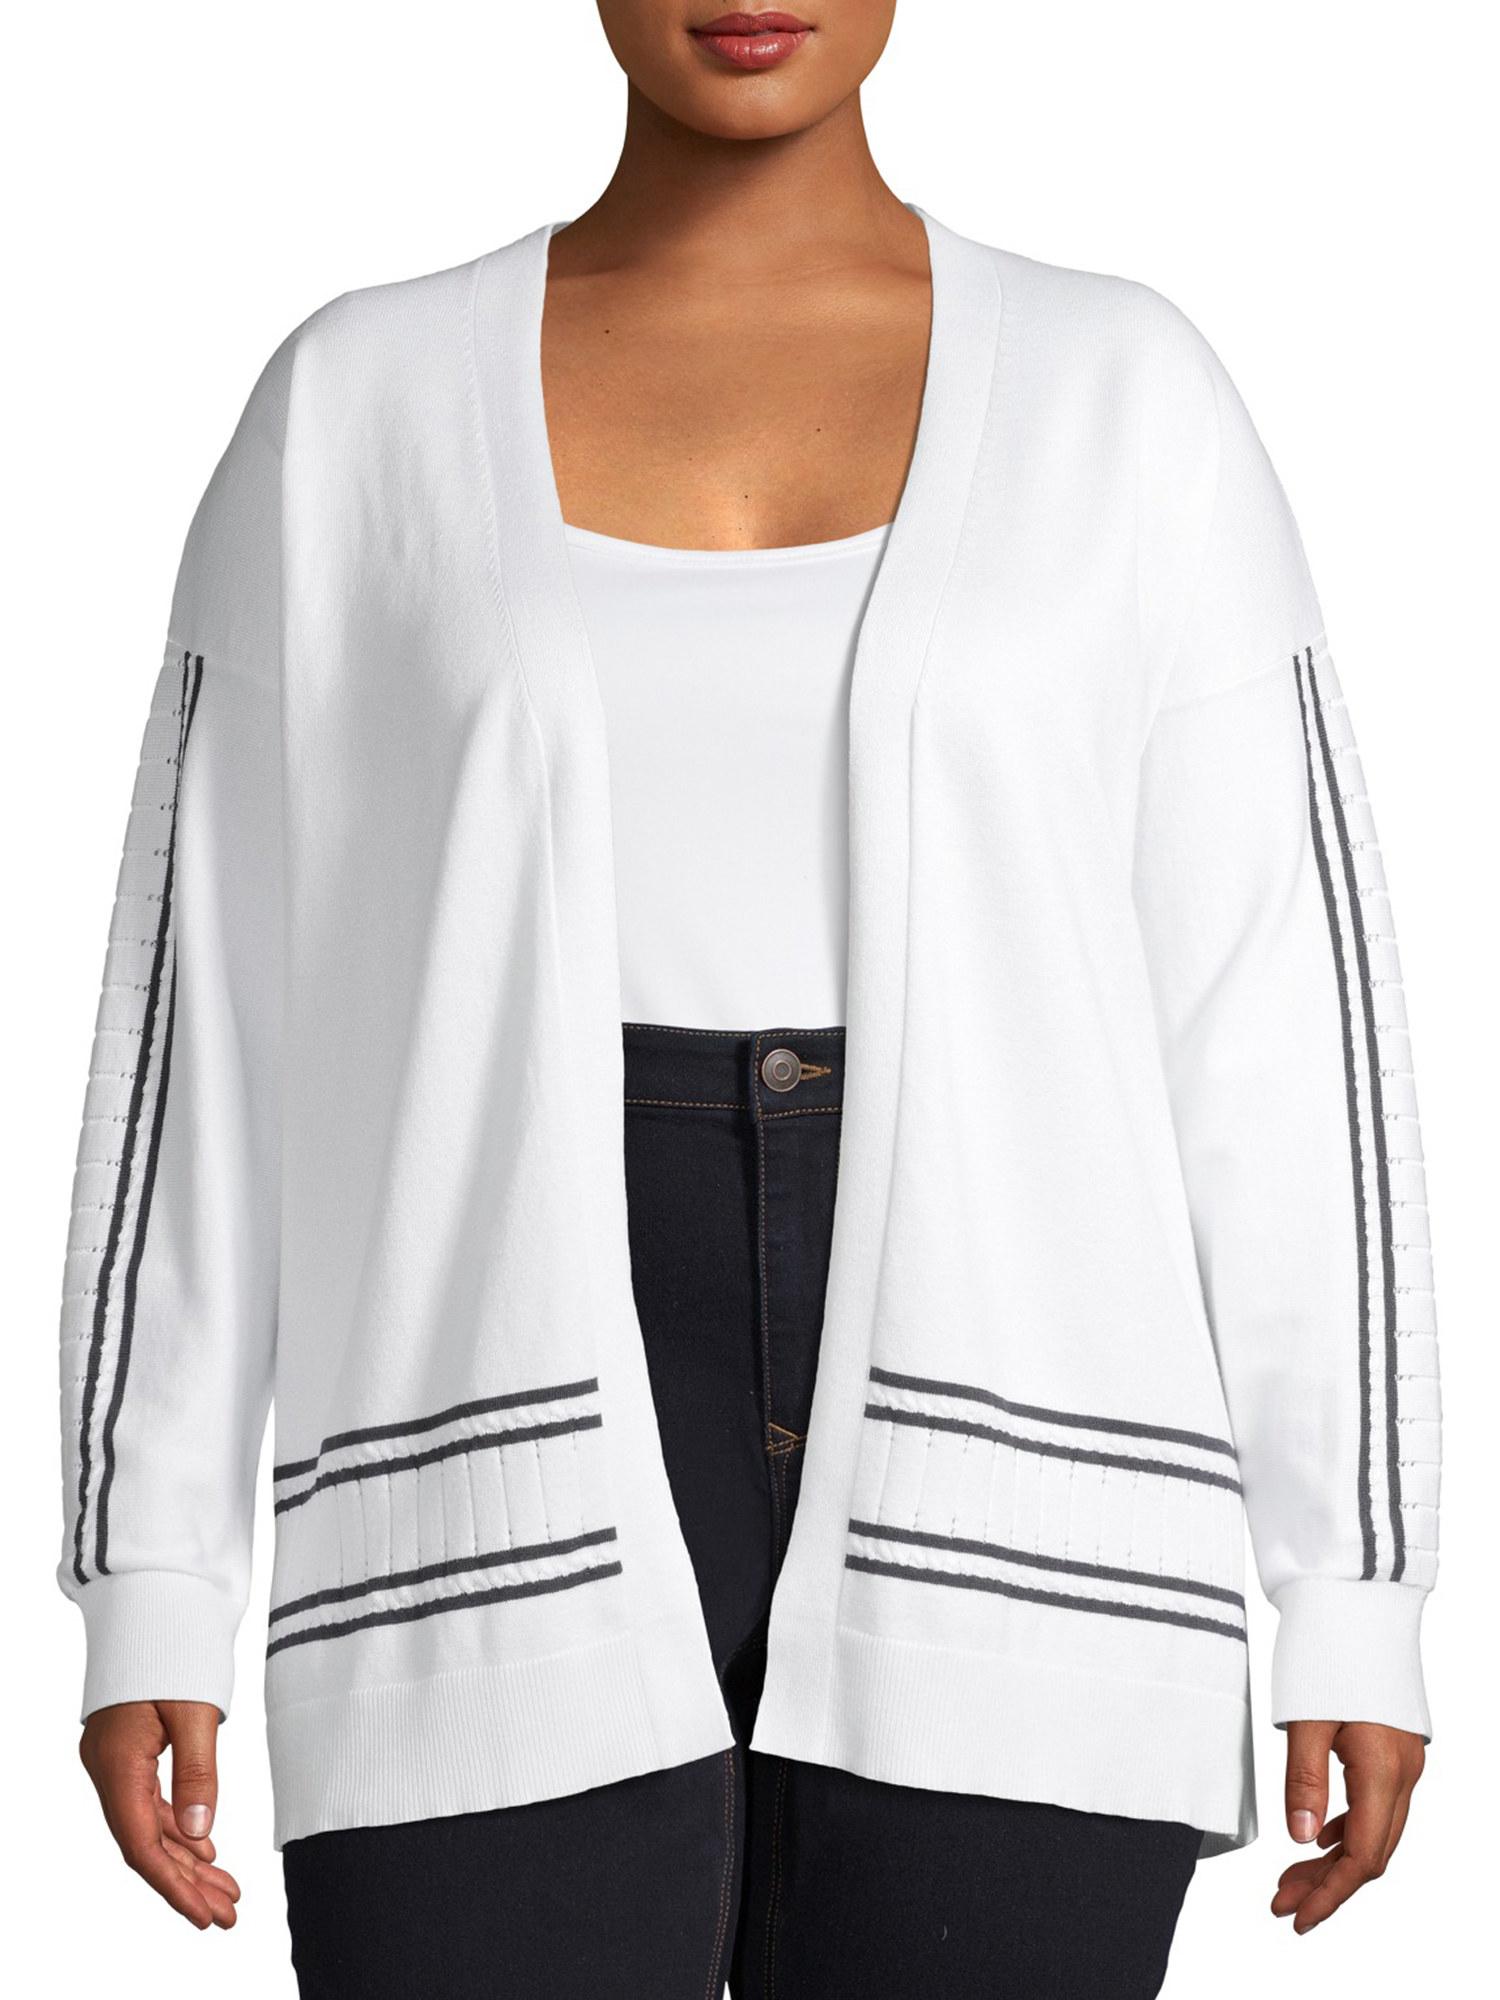 Model wearing the white/navy cardigan